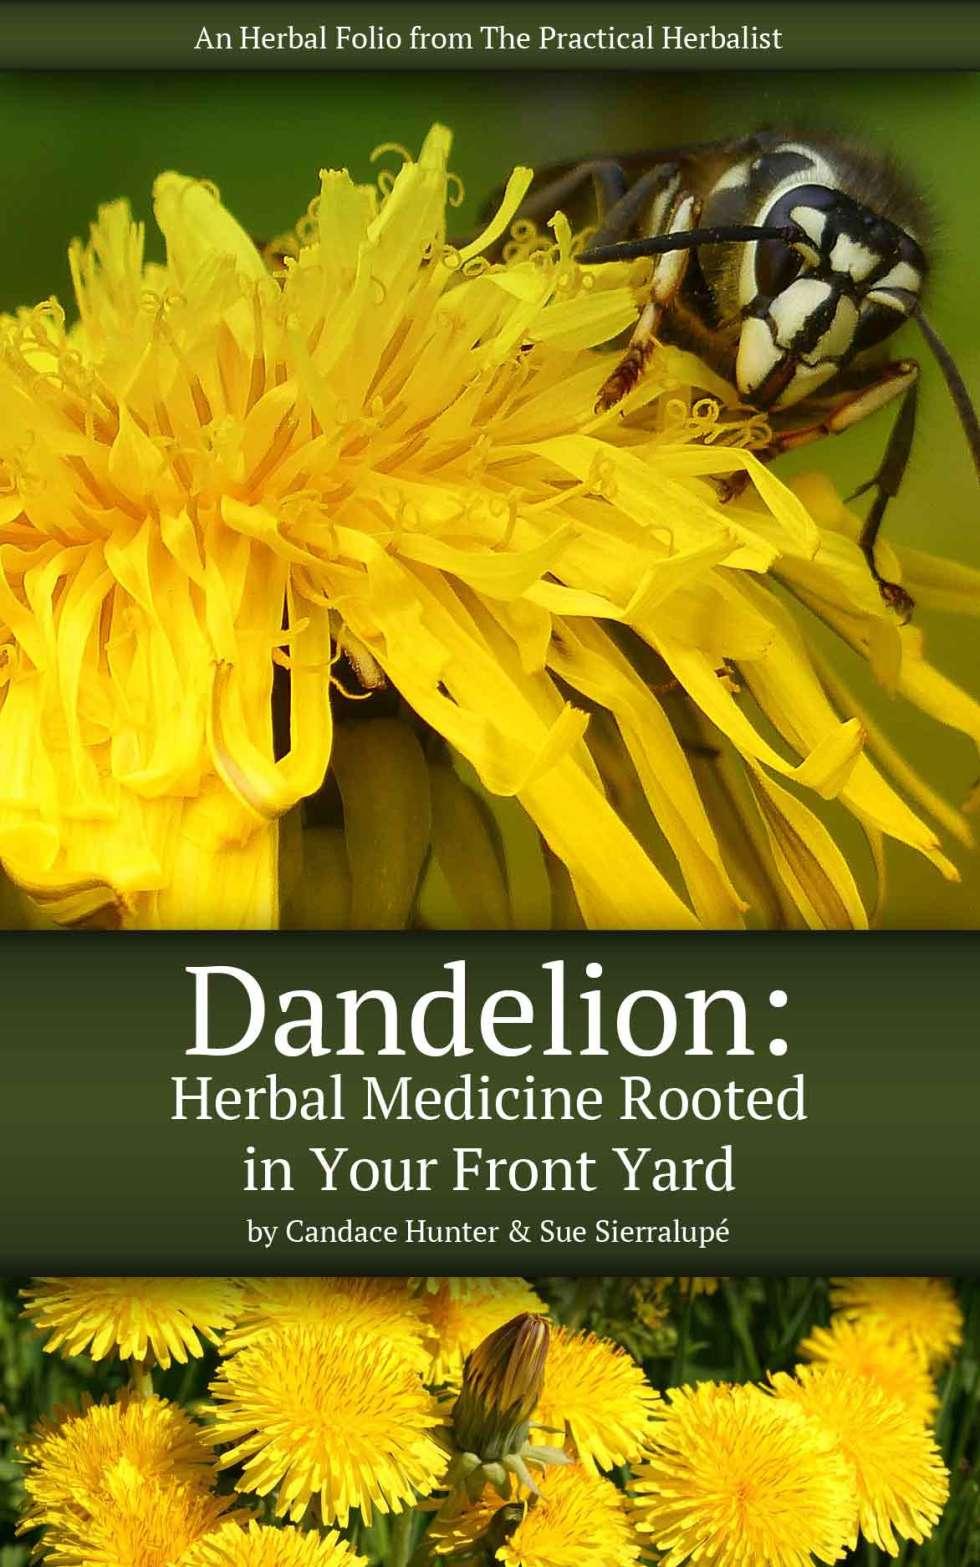 Dandelion Folio Cover